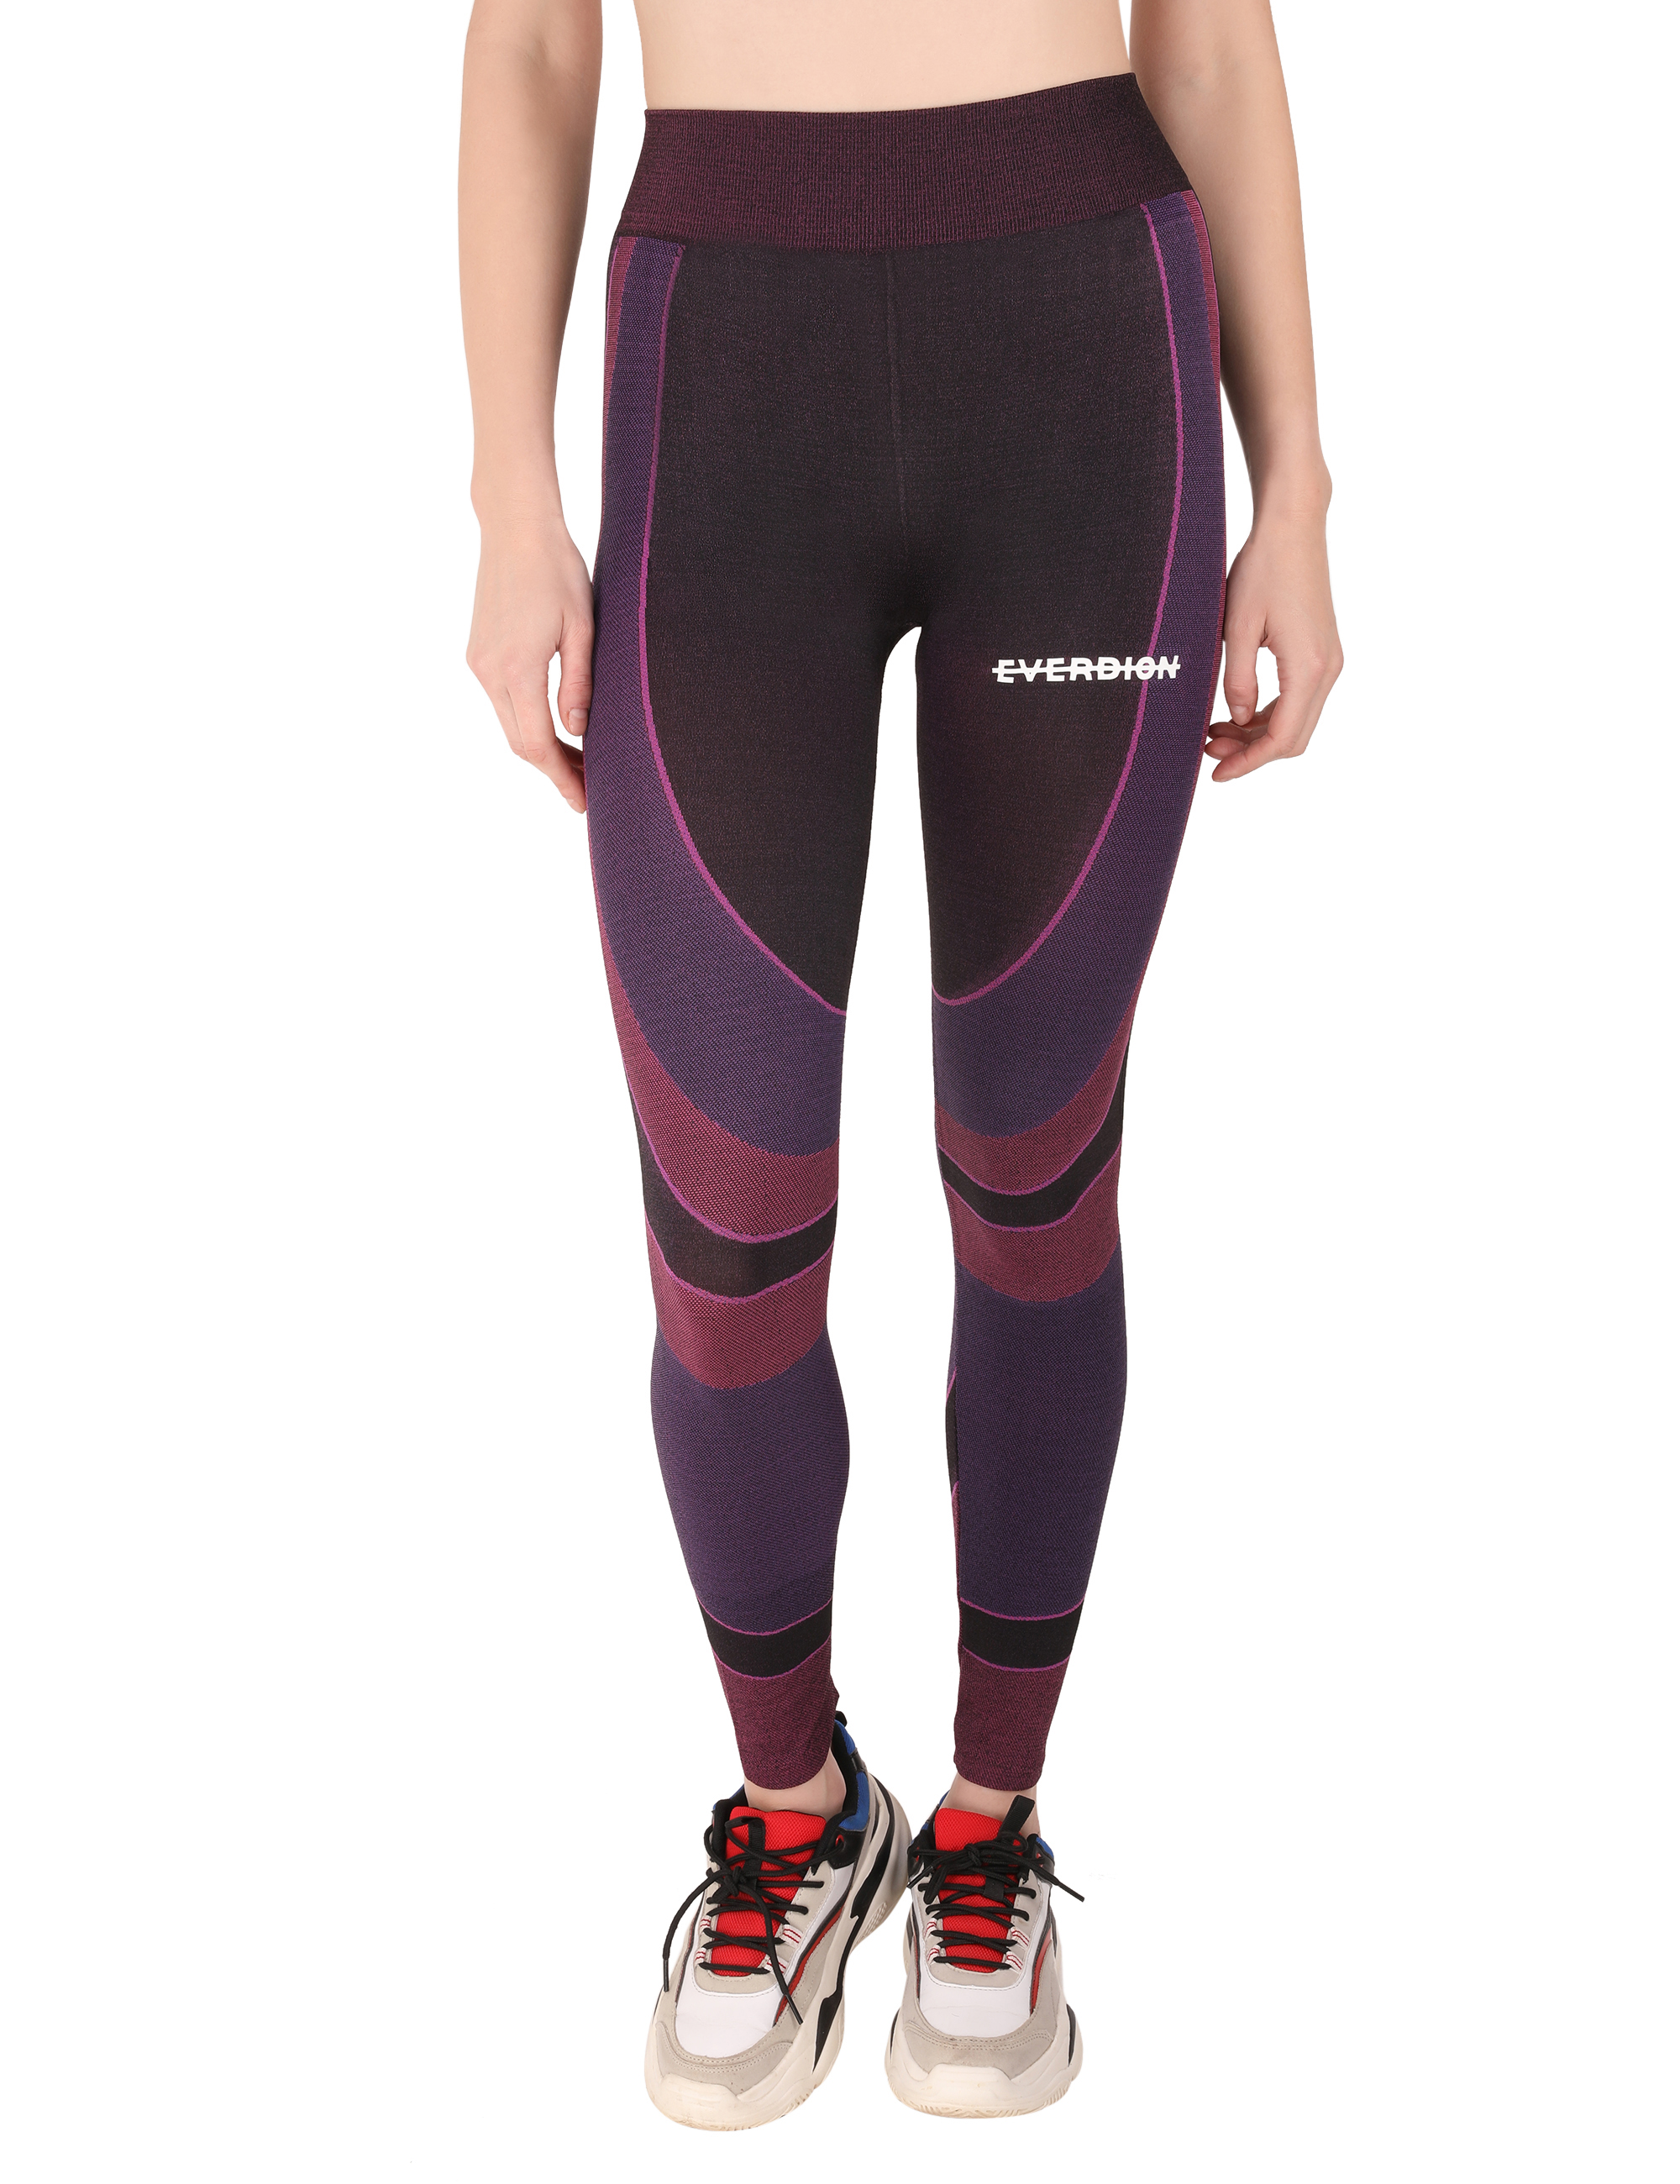 EVERDION | Purple Color Block Sports Leggings